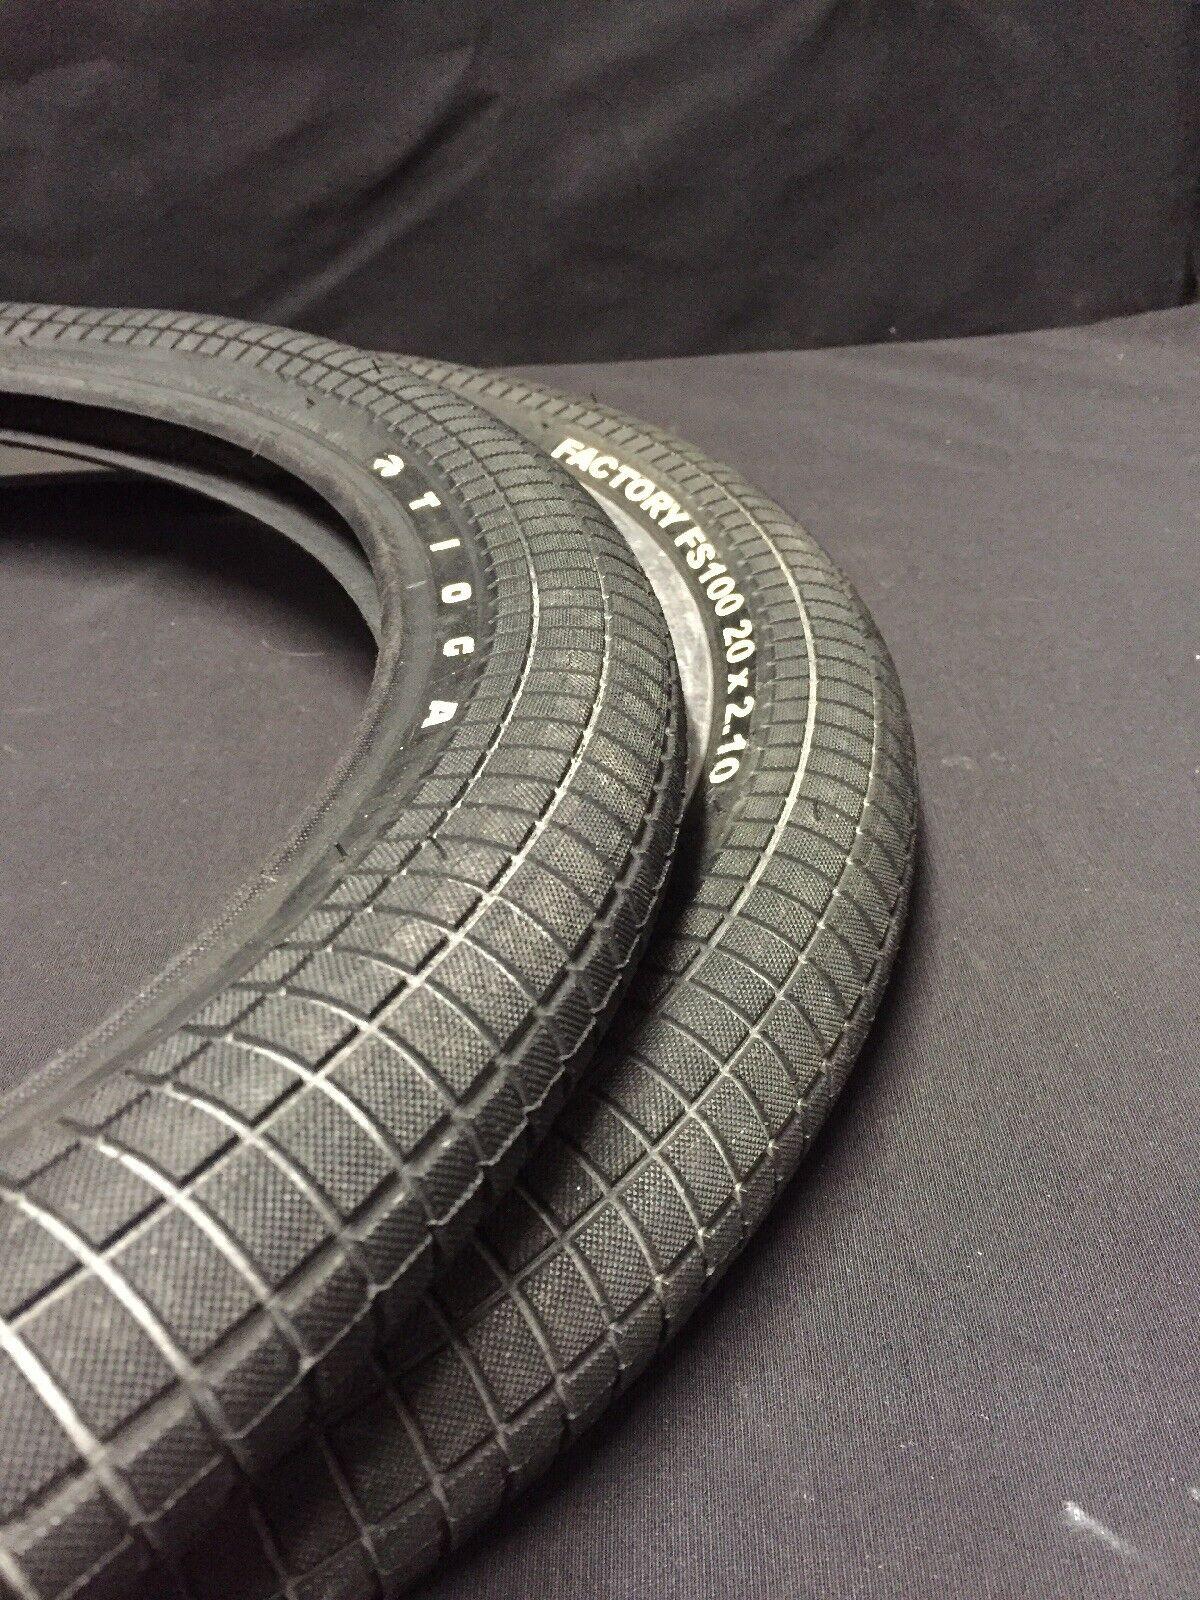 New 20x2.10 Tioga FS100 BMX tire set 100psi freestyle fits  Haro Redline Gt dyno